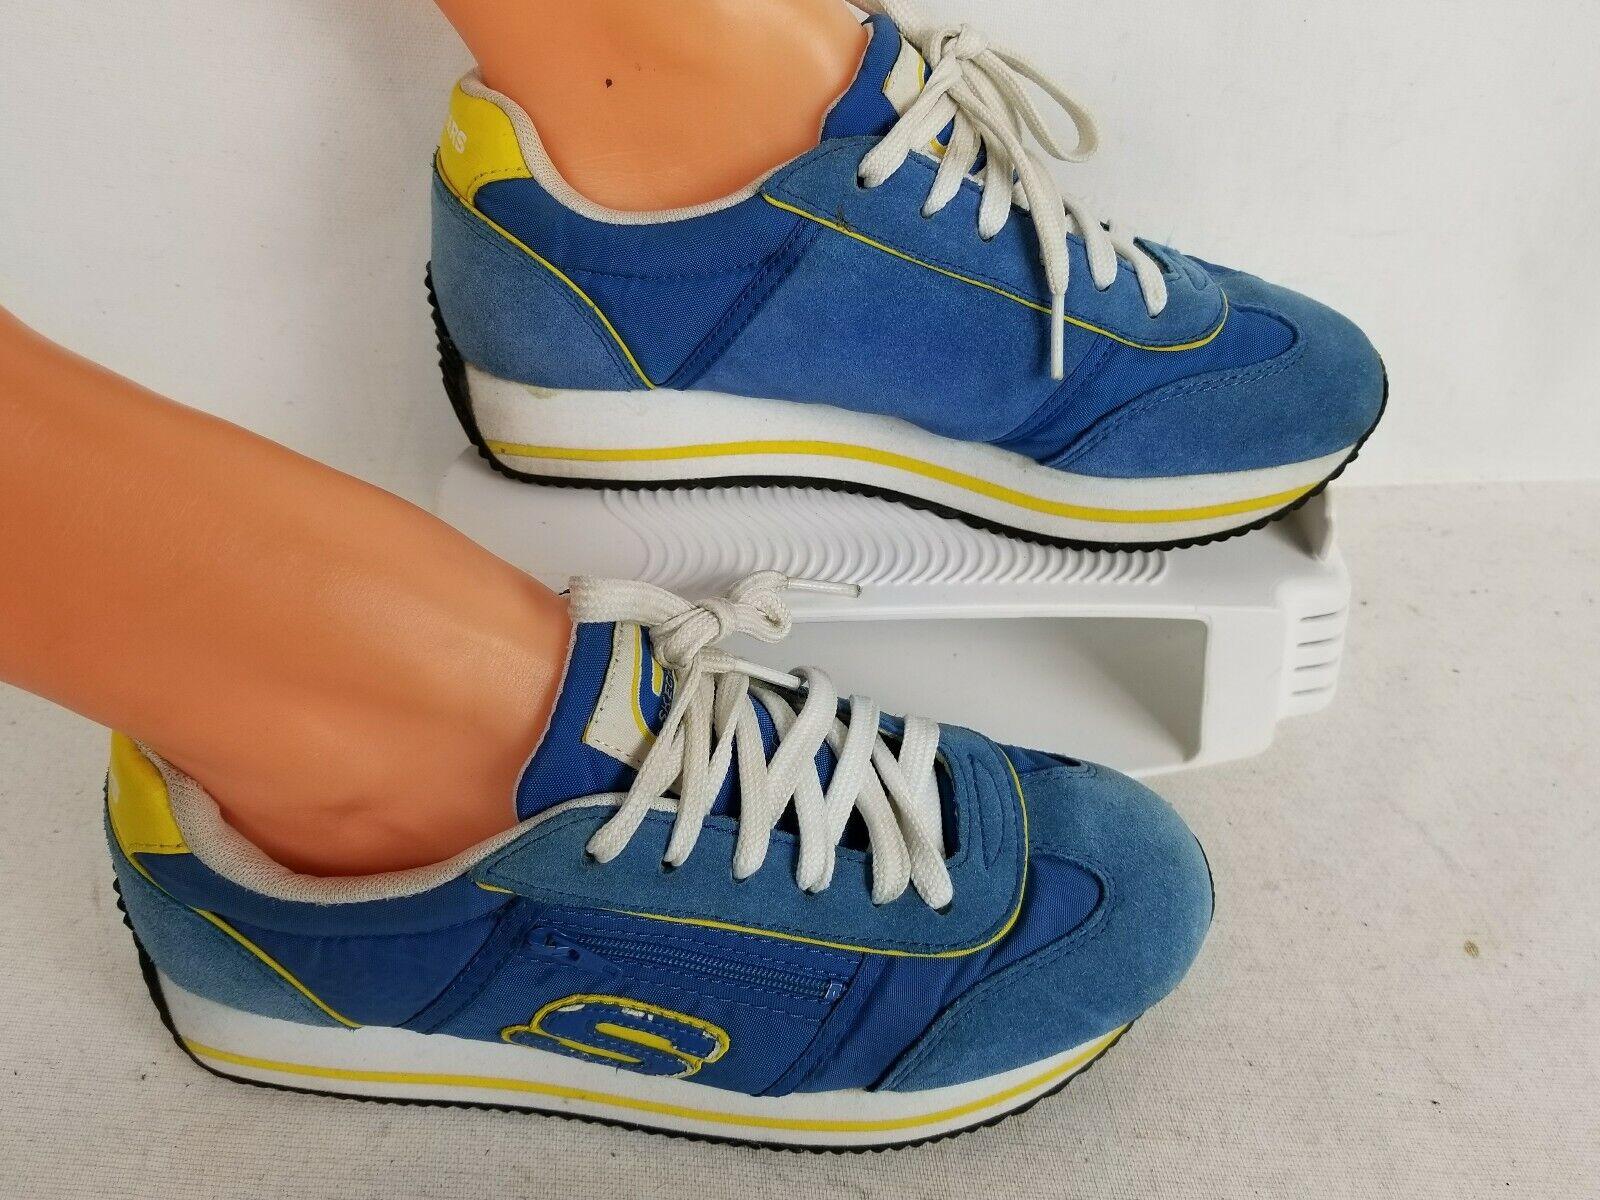 VTG WOMENS SKECHERS  COMFORT blueE WALKING SHOES SIZE 7.5